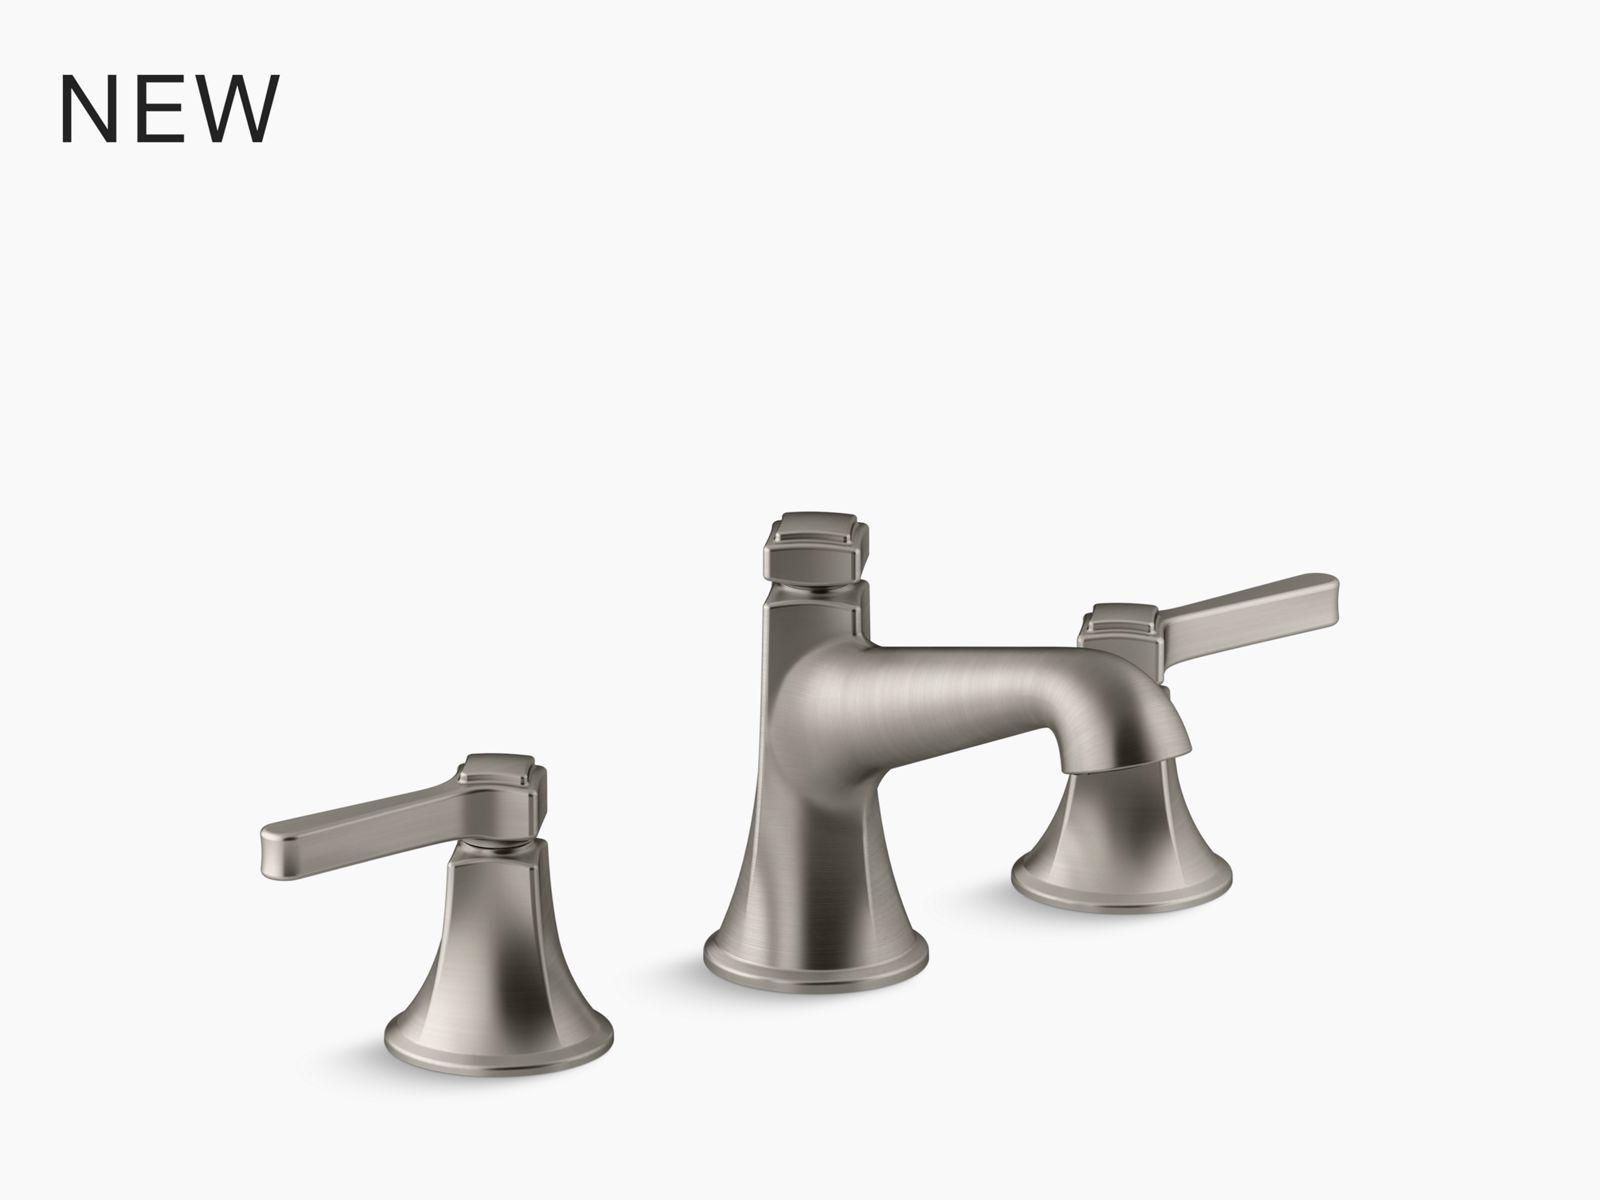 vox square vessel bathroom sink